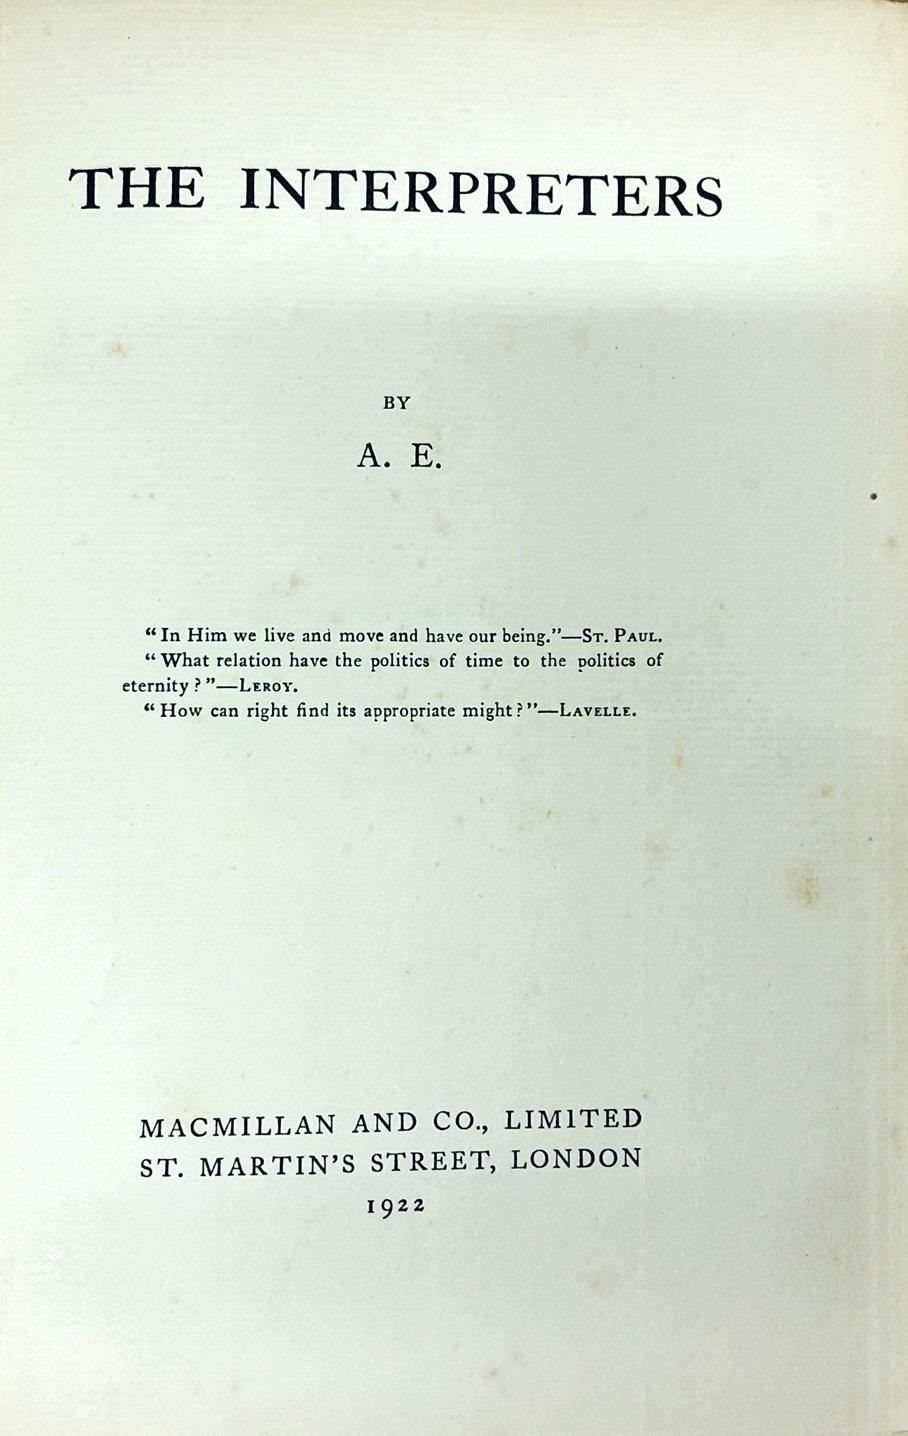 Lot 7 - Russell (Geo) 'A.E.' - The Interpreters, L. 1922. First Edn., orig. & orig. d.w.